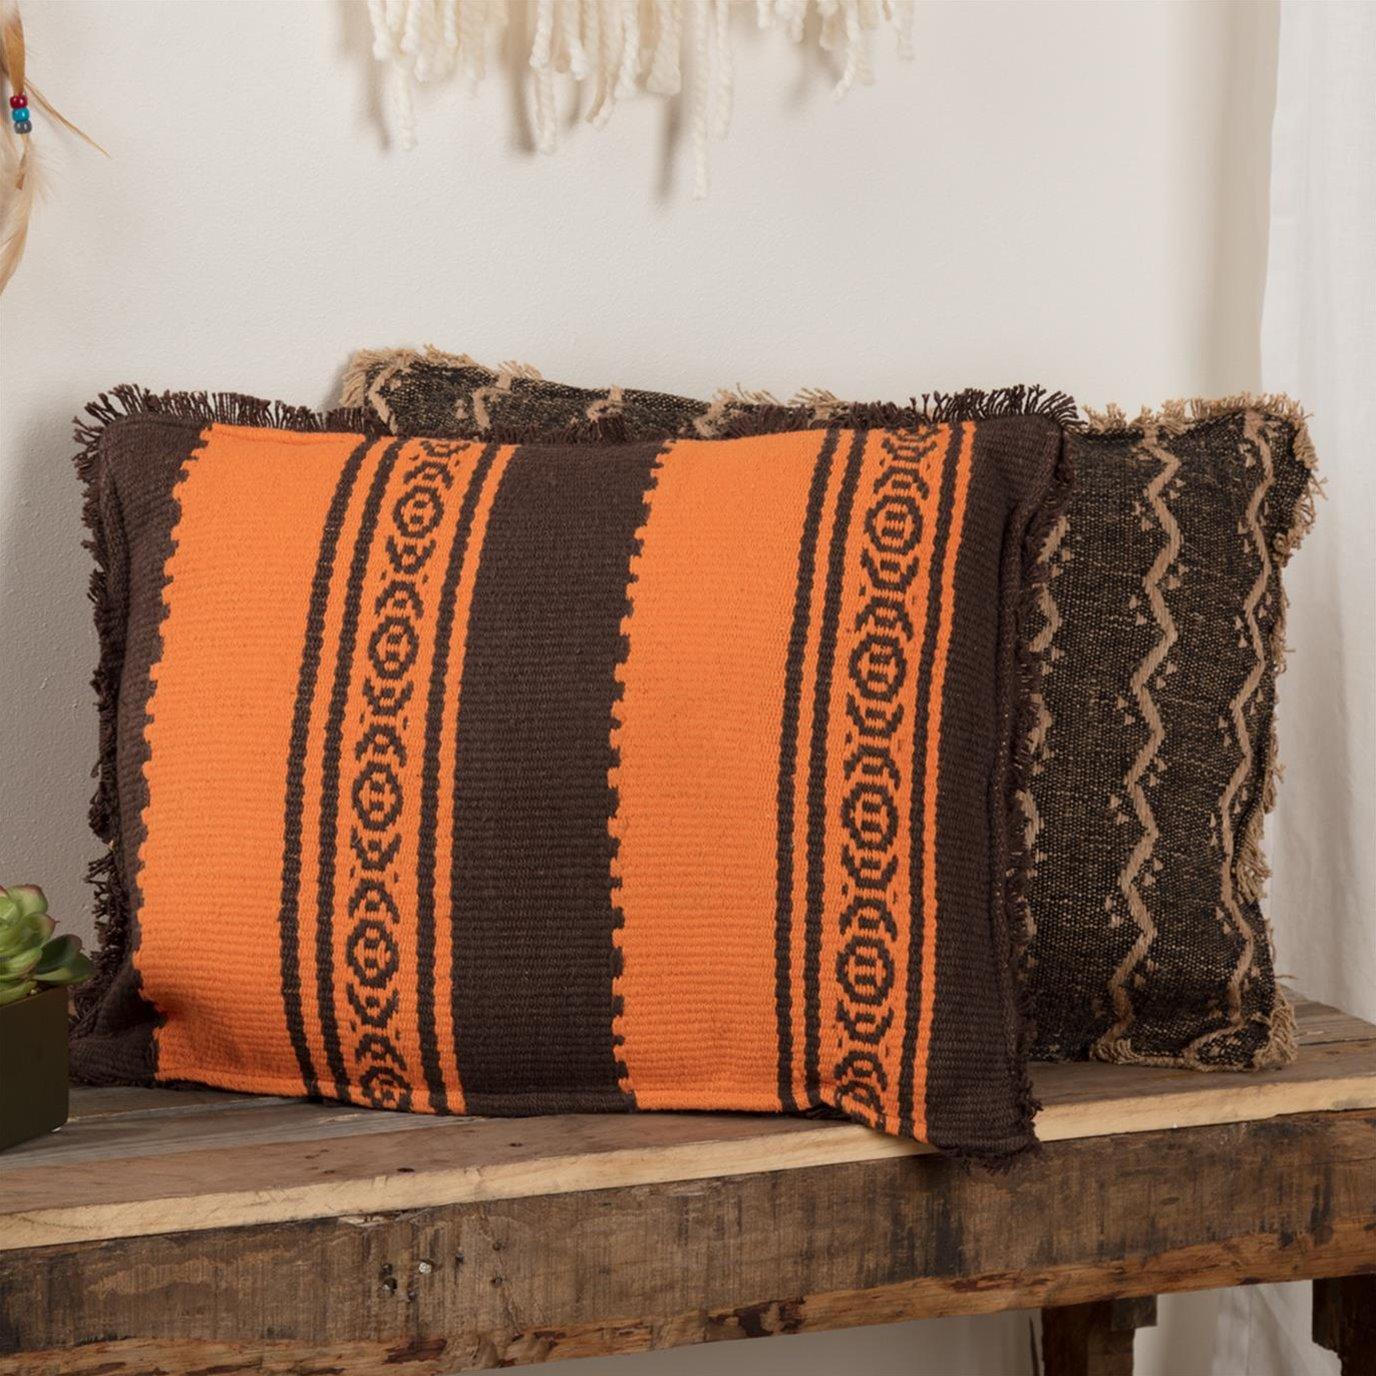 Jessica Jacquard Pillow 14x18